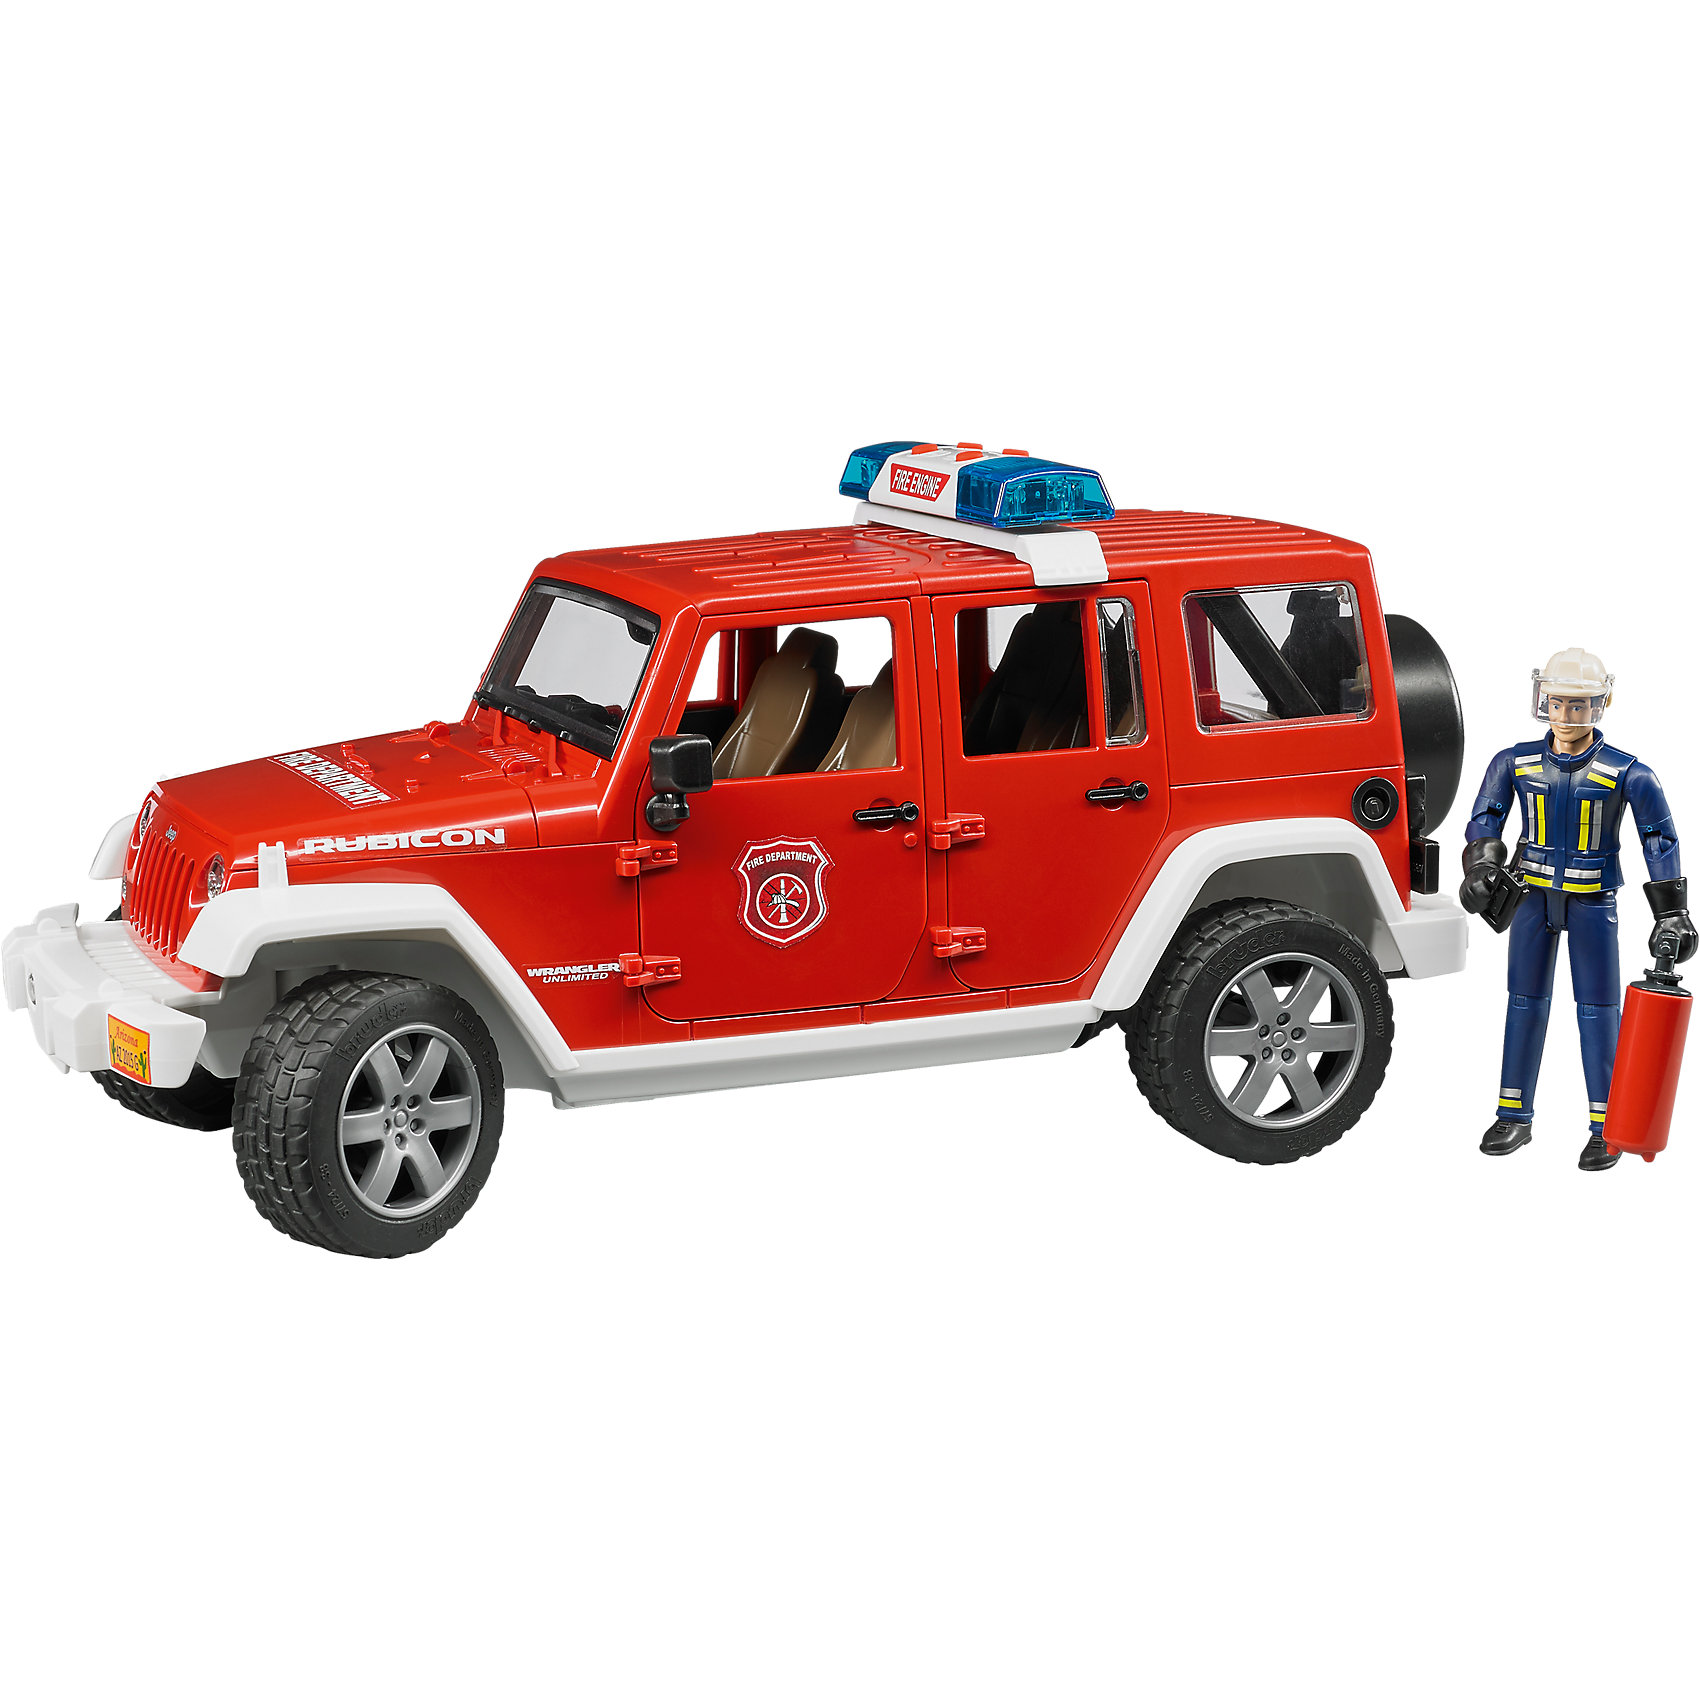 Внедорожник Jeep Wrangler Unlimited Rubicon Пожарная с фигуркой, BruderМашинки<br><br><br>Ширина мм: 510<br>Глубина мм: 180<br>Высота мм: 193<br>Вес г: 1196<br>Возраст от месяцев: 36<br>Возраст до месяцев: 84<br>Пол: Мужской<br>Возраст: Детский<br>SKU: 5274490